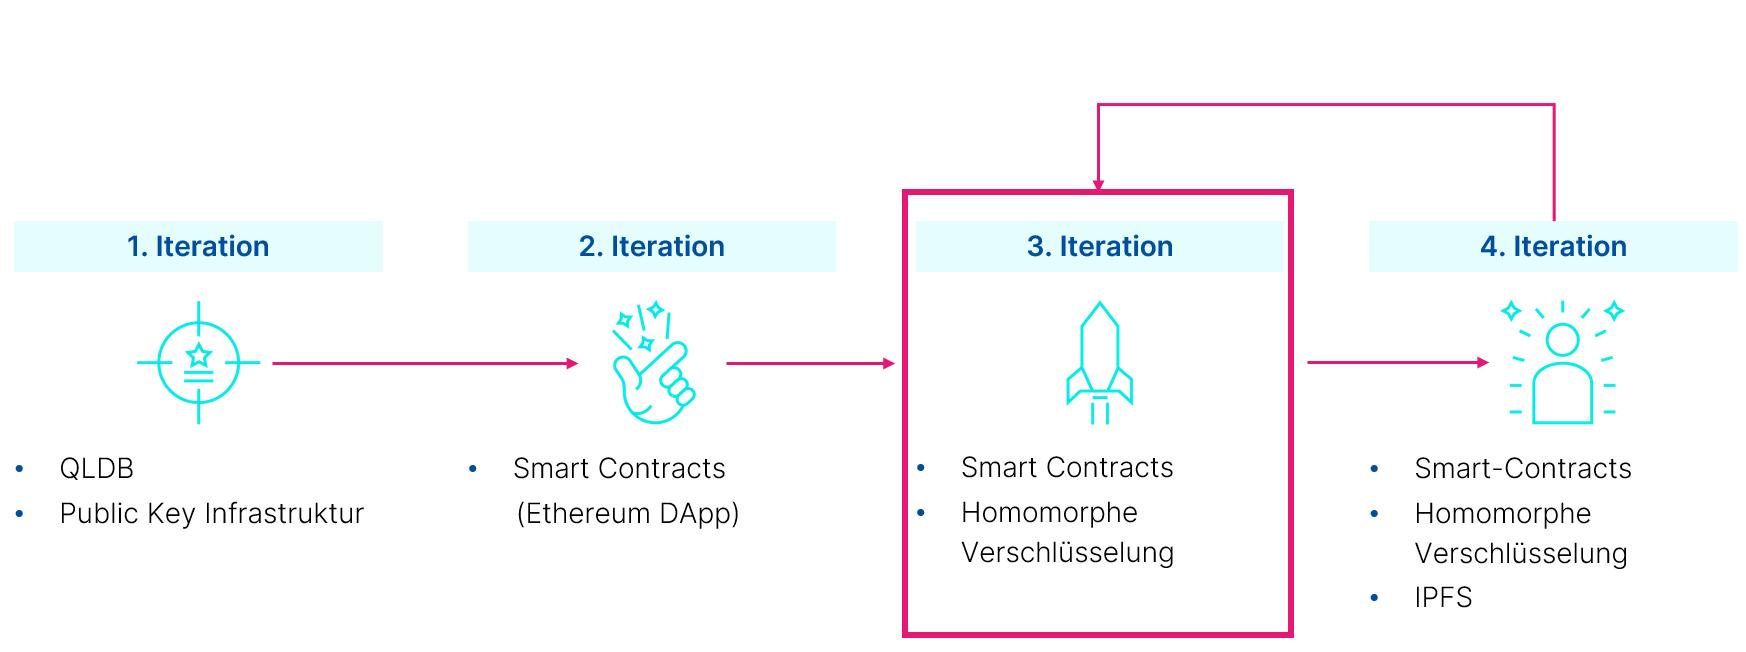 Benchmarking Distributed Ledger Monorepo - 分布式账本回购基准测试